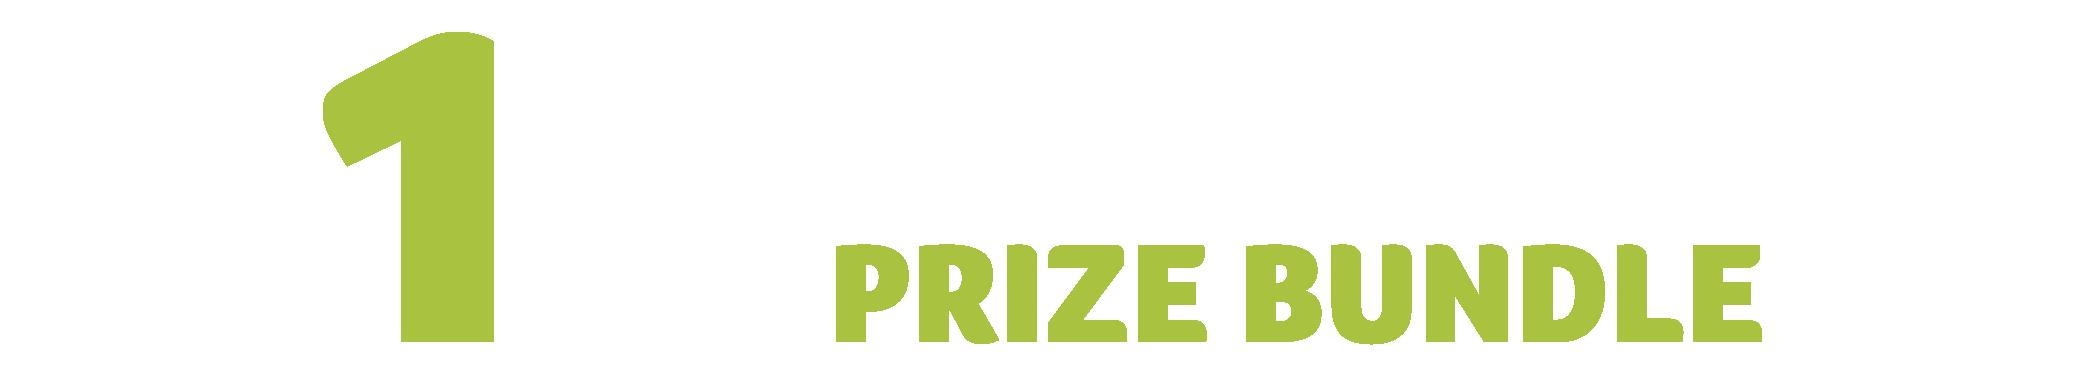 Fan-Awards-Website-Elements_Ultimate bundle prize